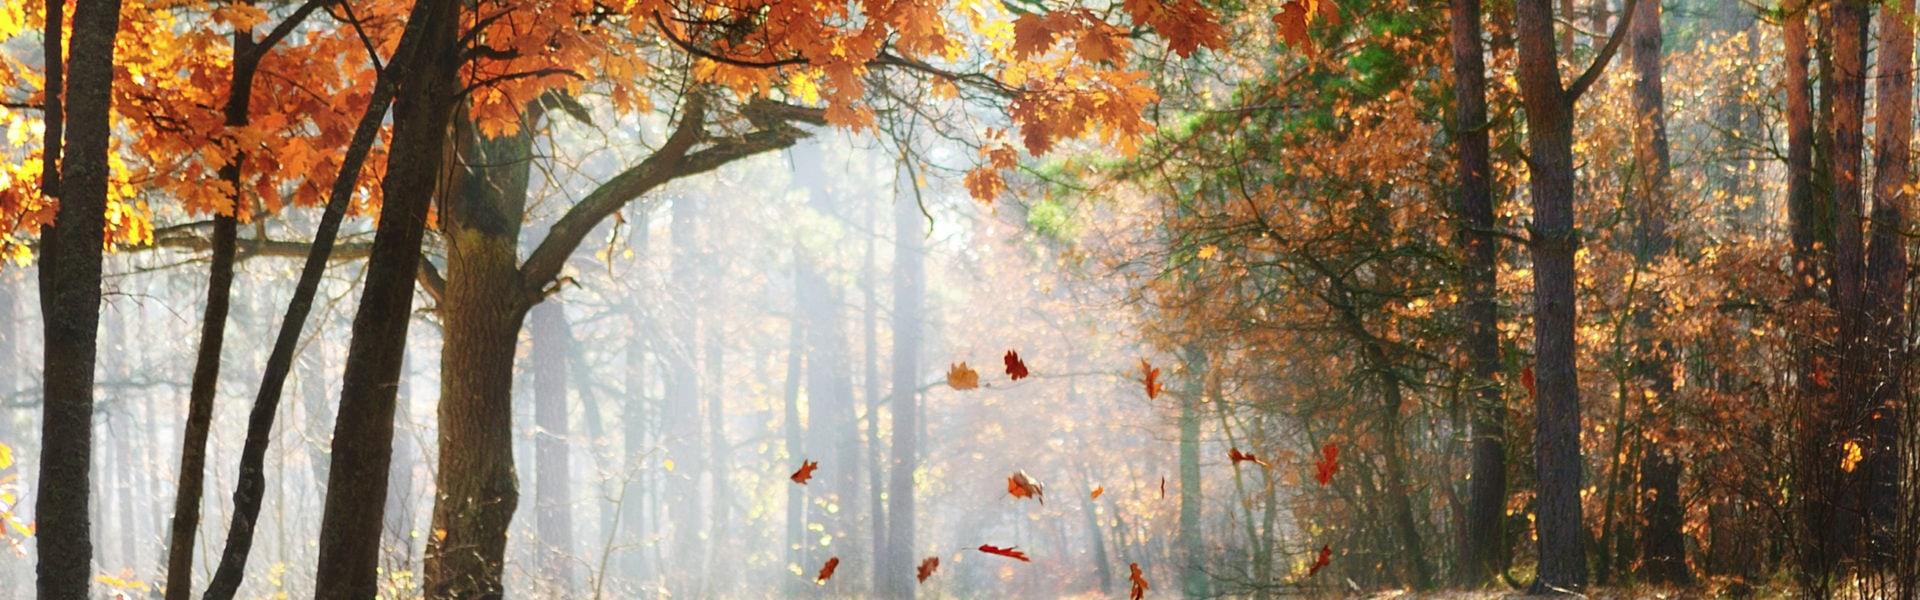 Efterårsferien